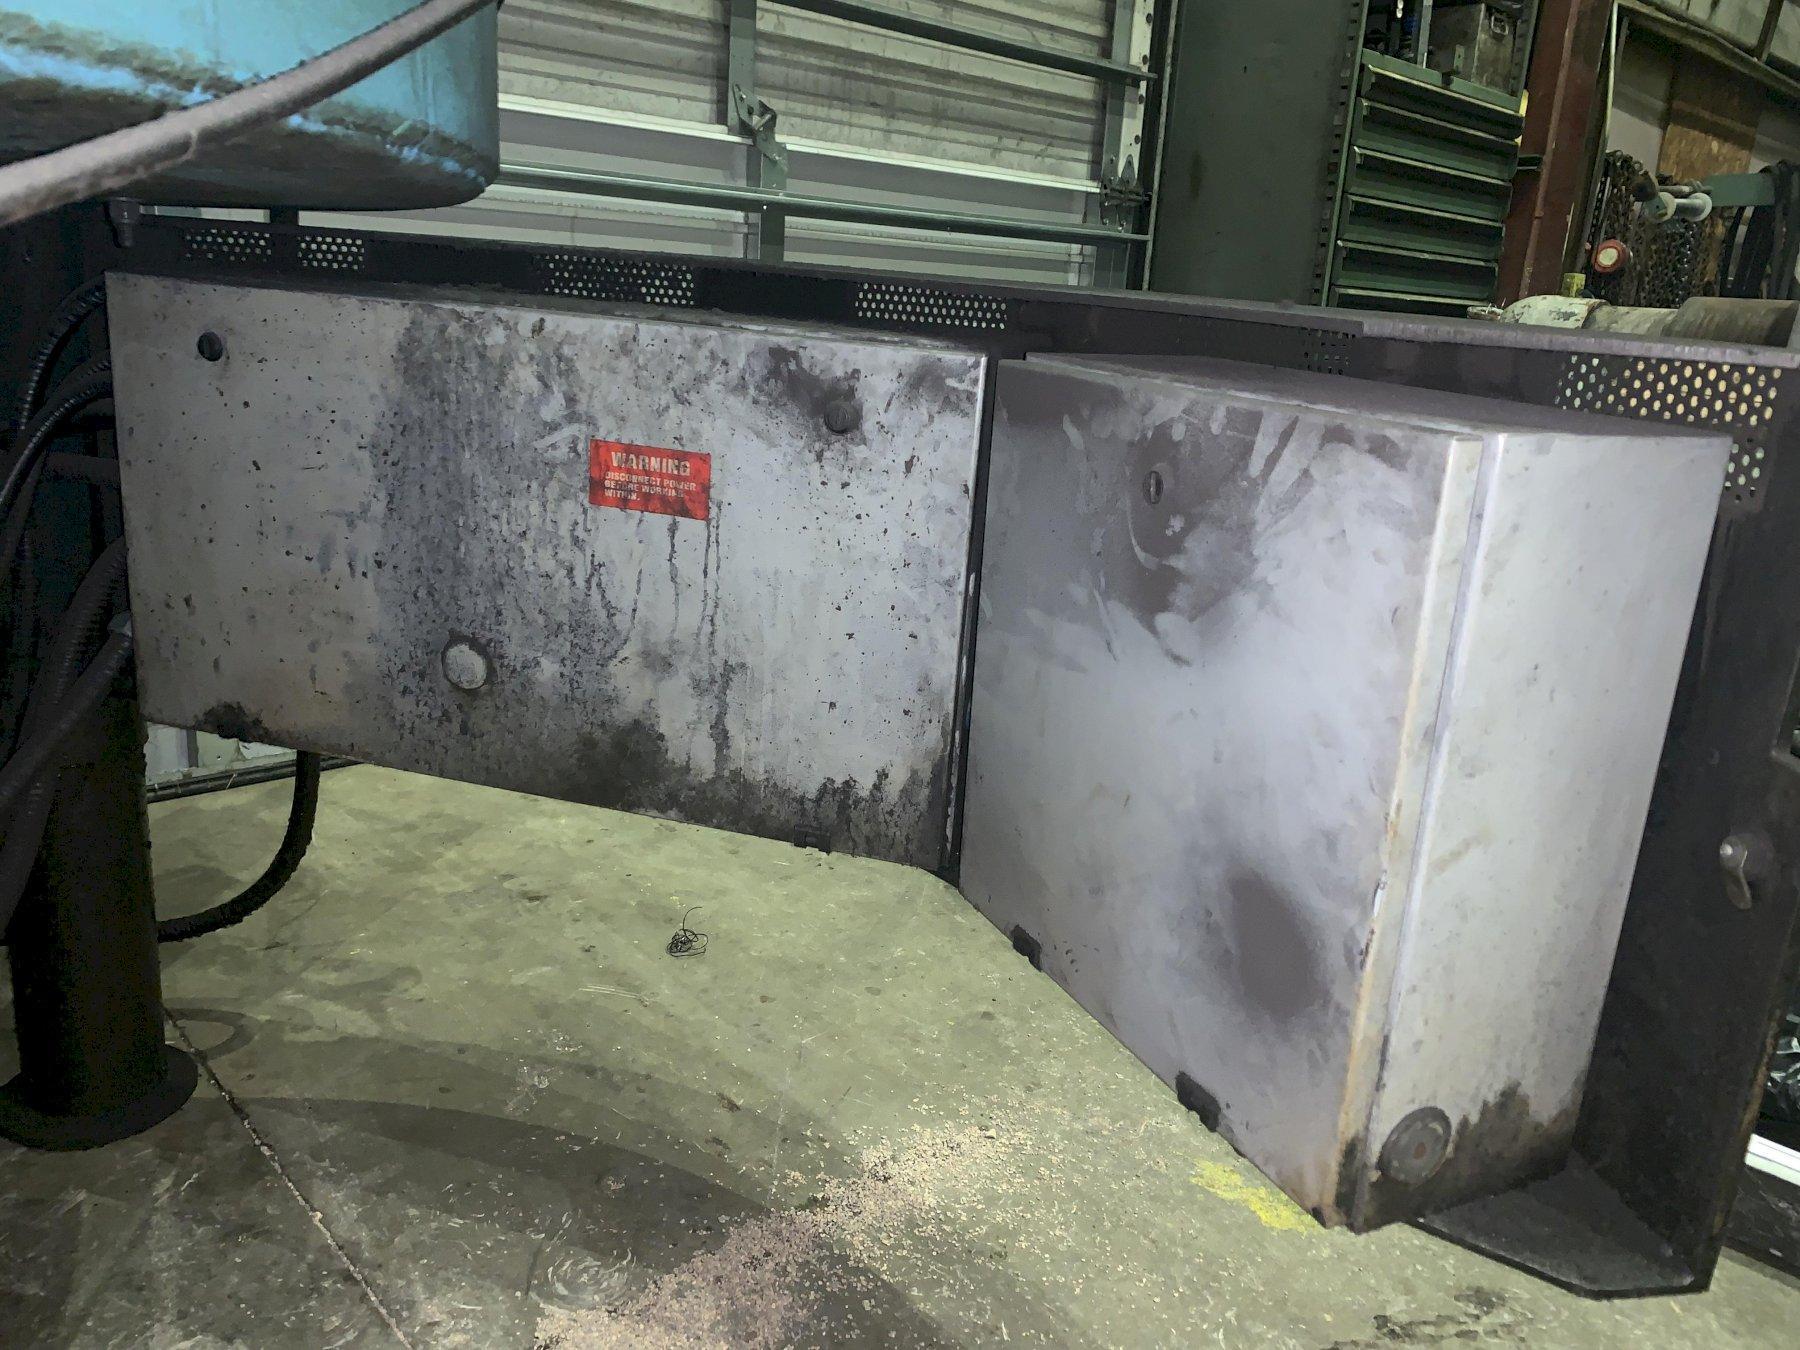 600 DEGREE PYROMAITRE MODEL #TD60-LG TURBO NATURAL GAS ROTARY OVEN: STOCK #10853